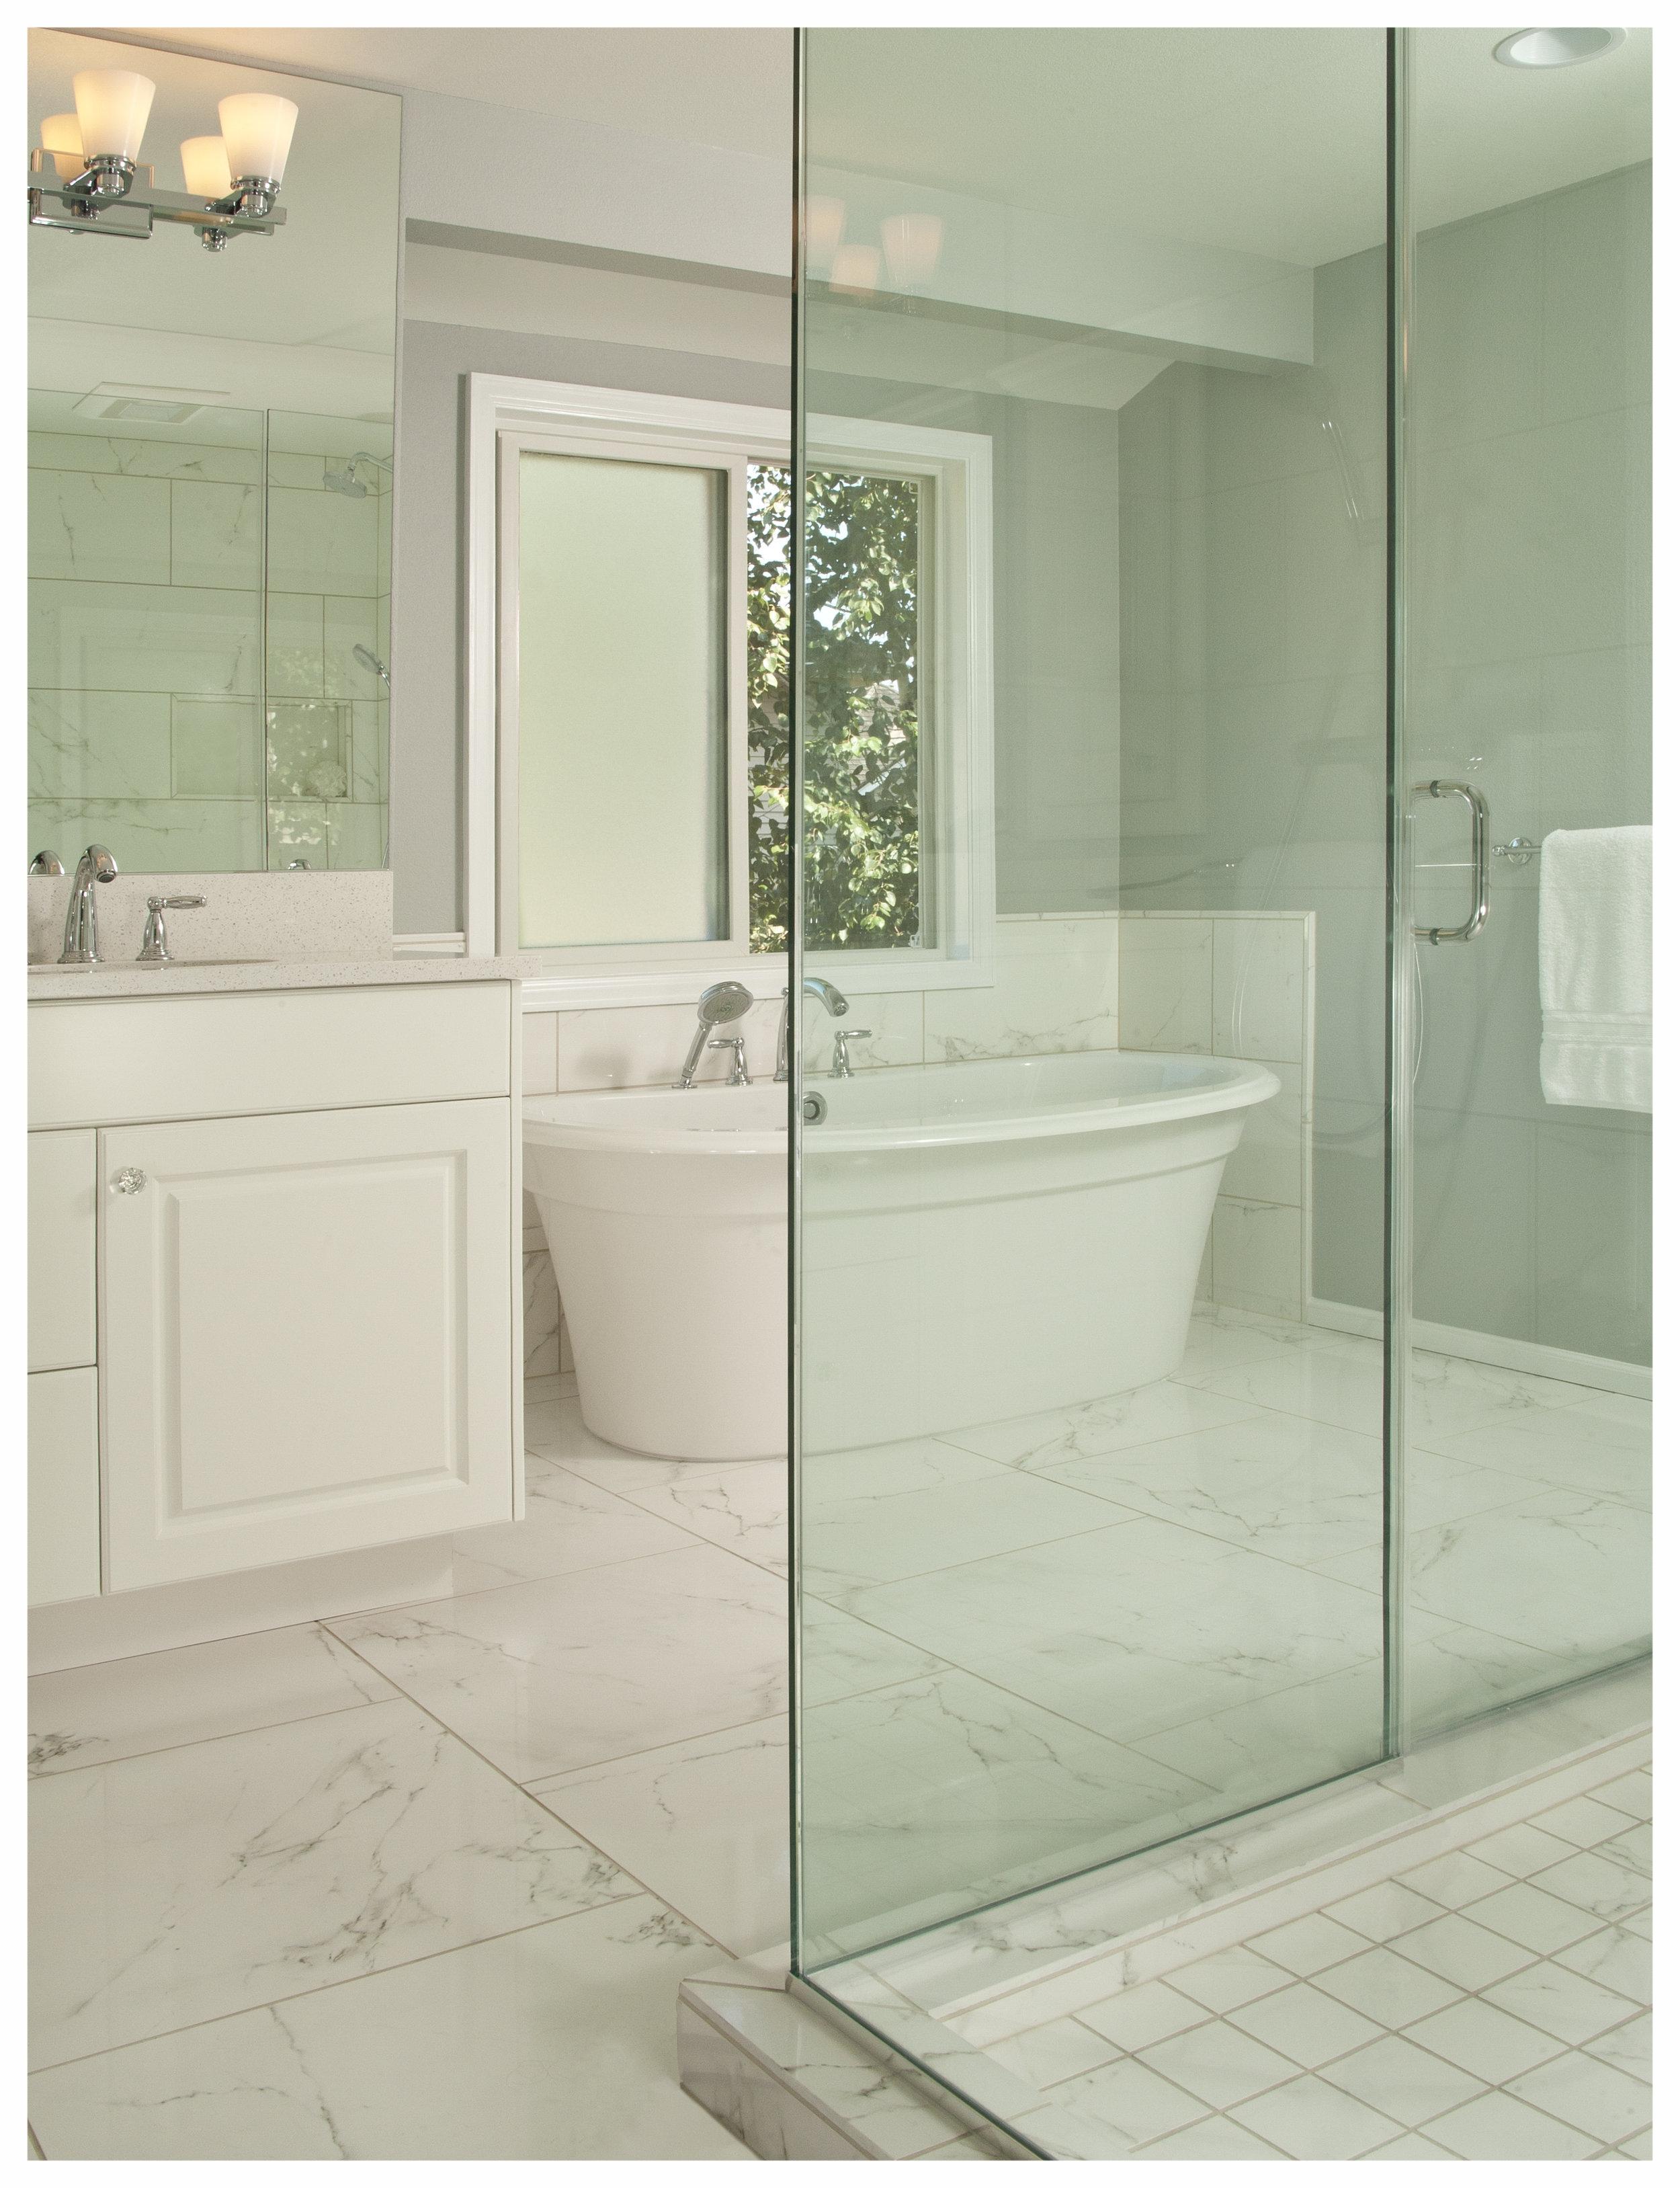 Bellevue Lakemont Traditional Master Bath 2.jpg